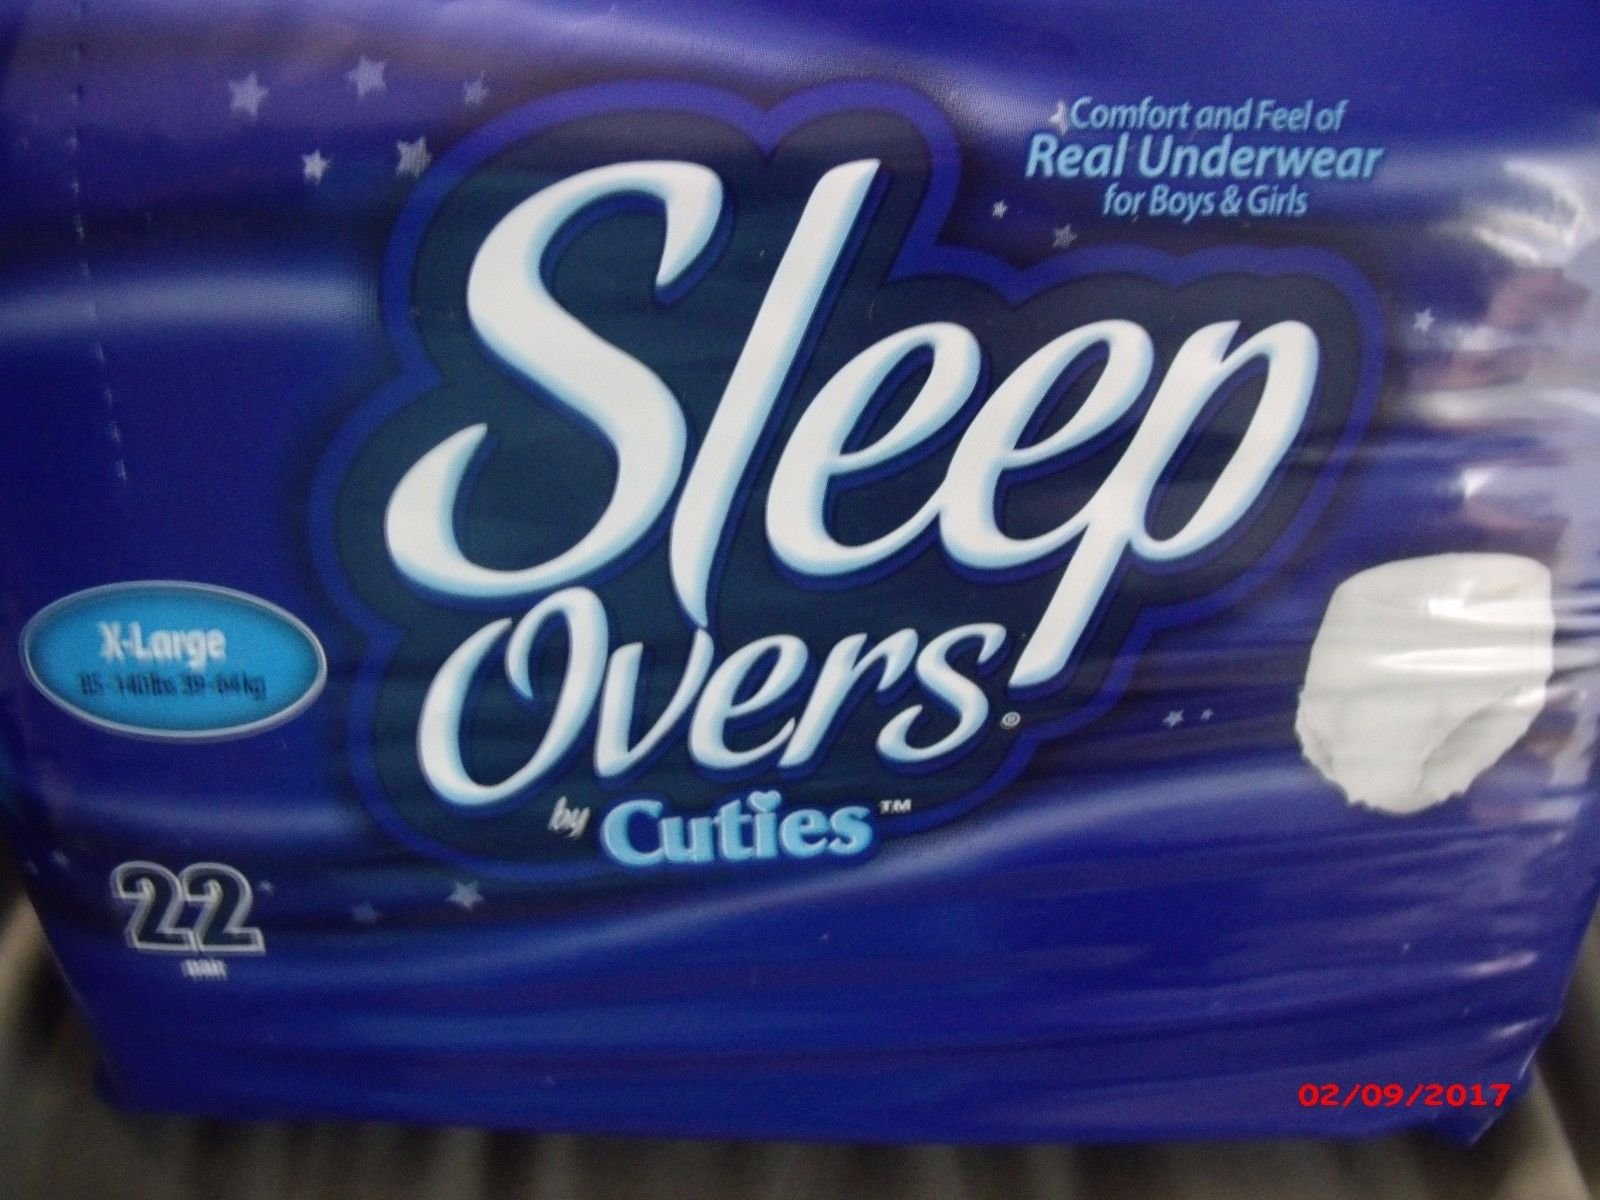 Sleep Overs X- Large XL 85lb-140lb by Cuties